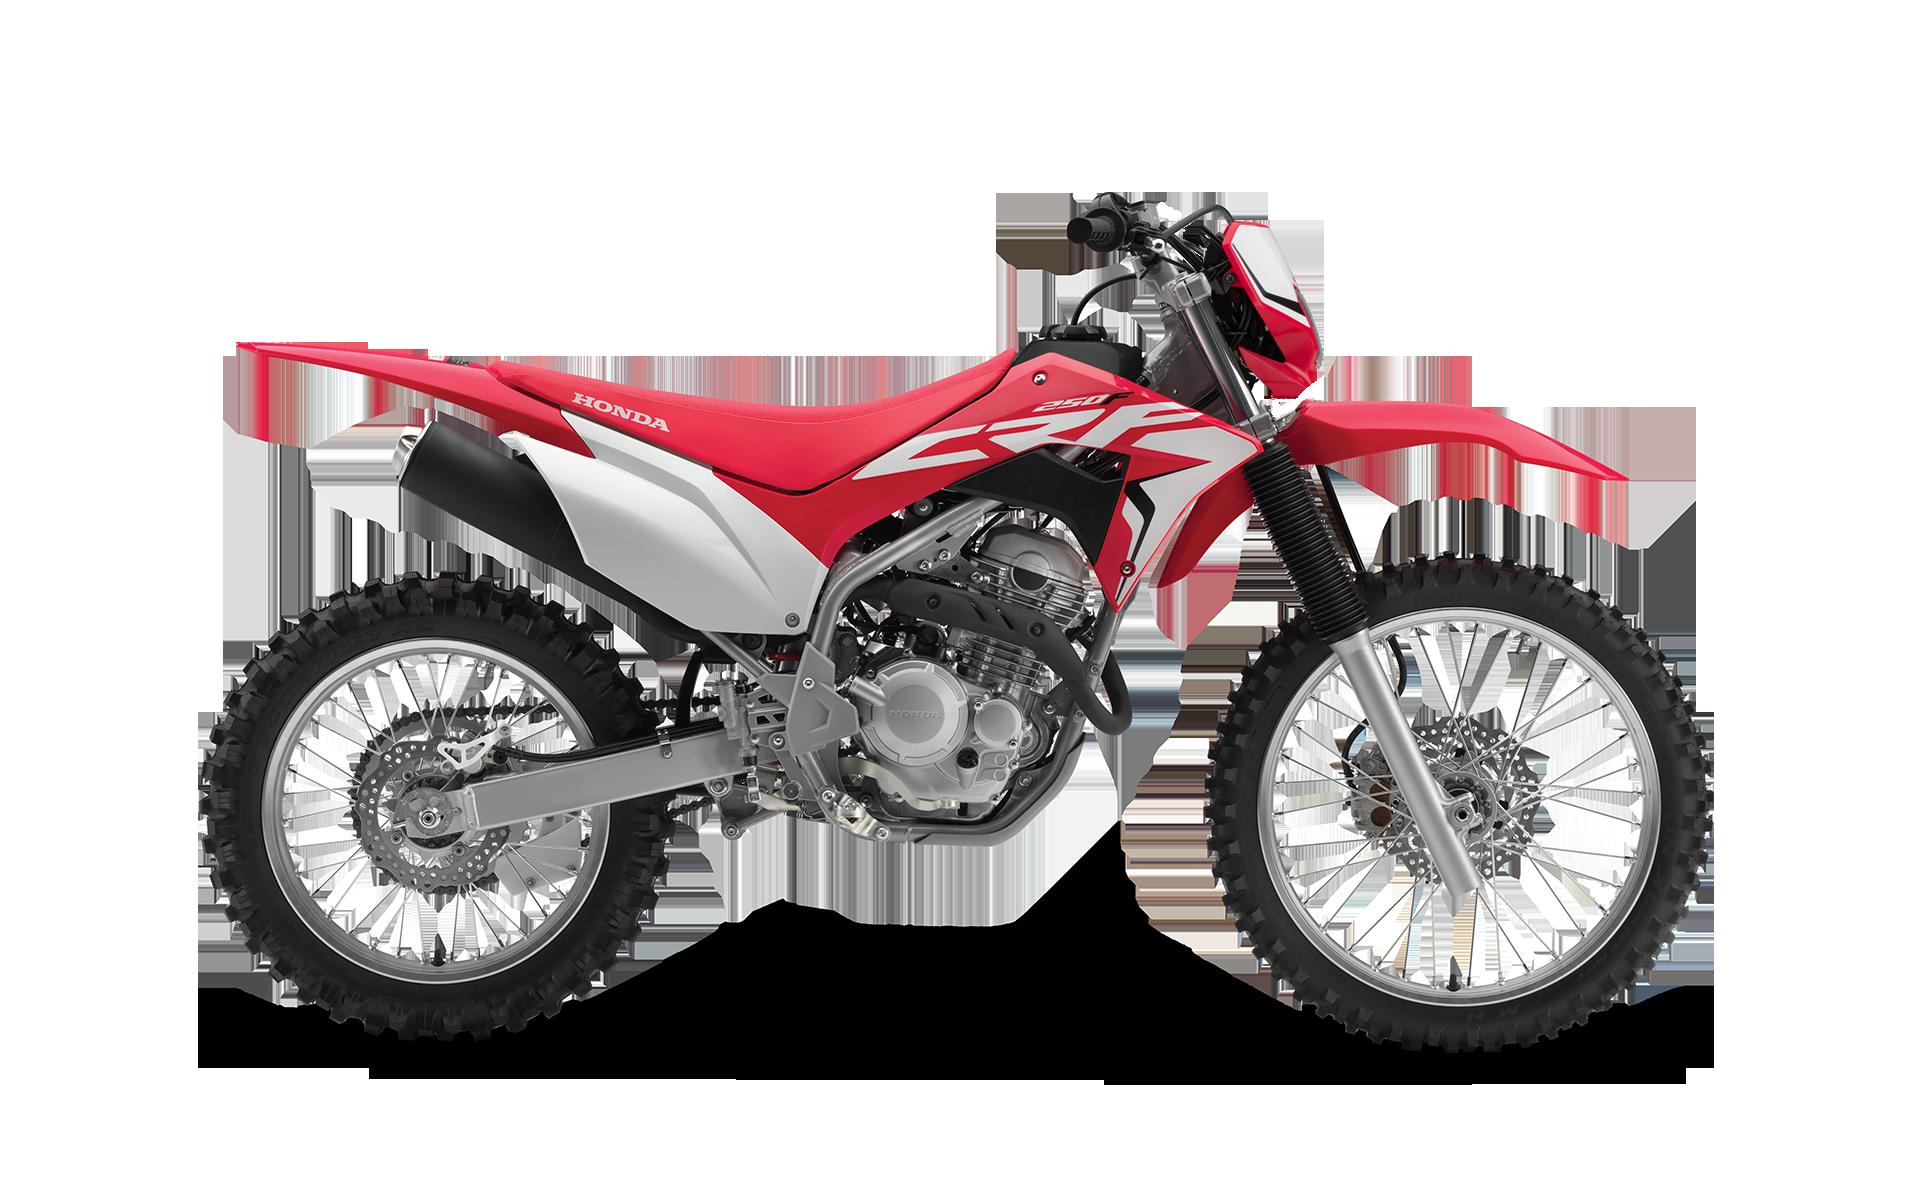 2019 Honda CRF250F Pre-Order Bonus Offer